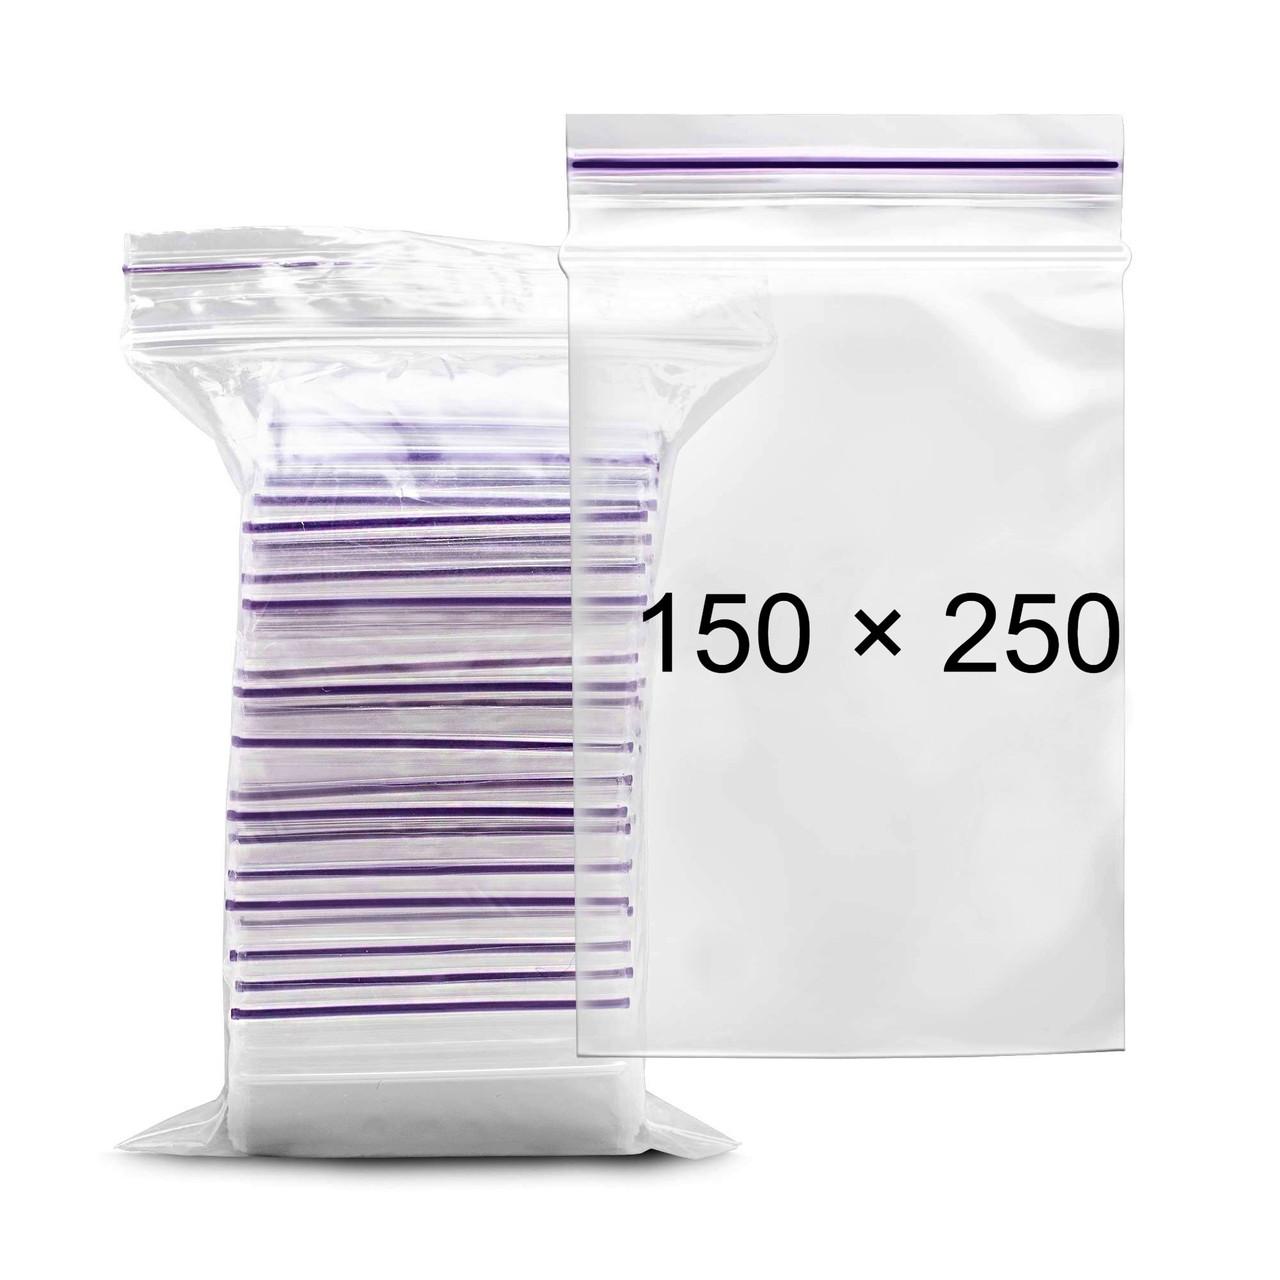 Пакеты с замком Zip-Lock - 150 × 250